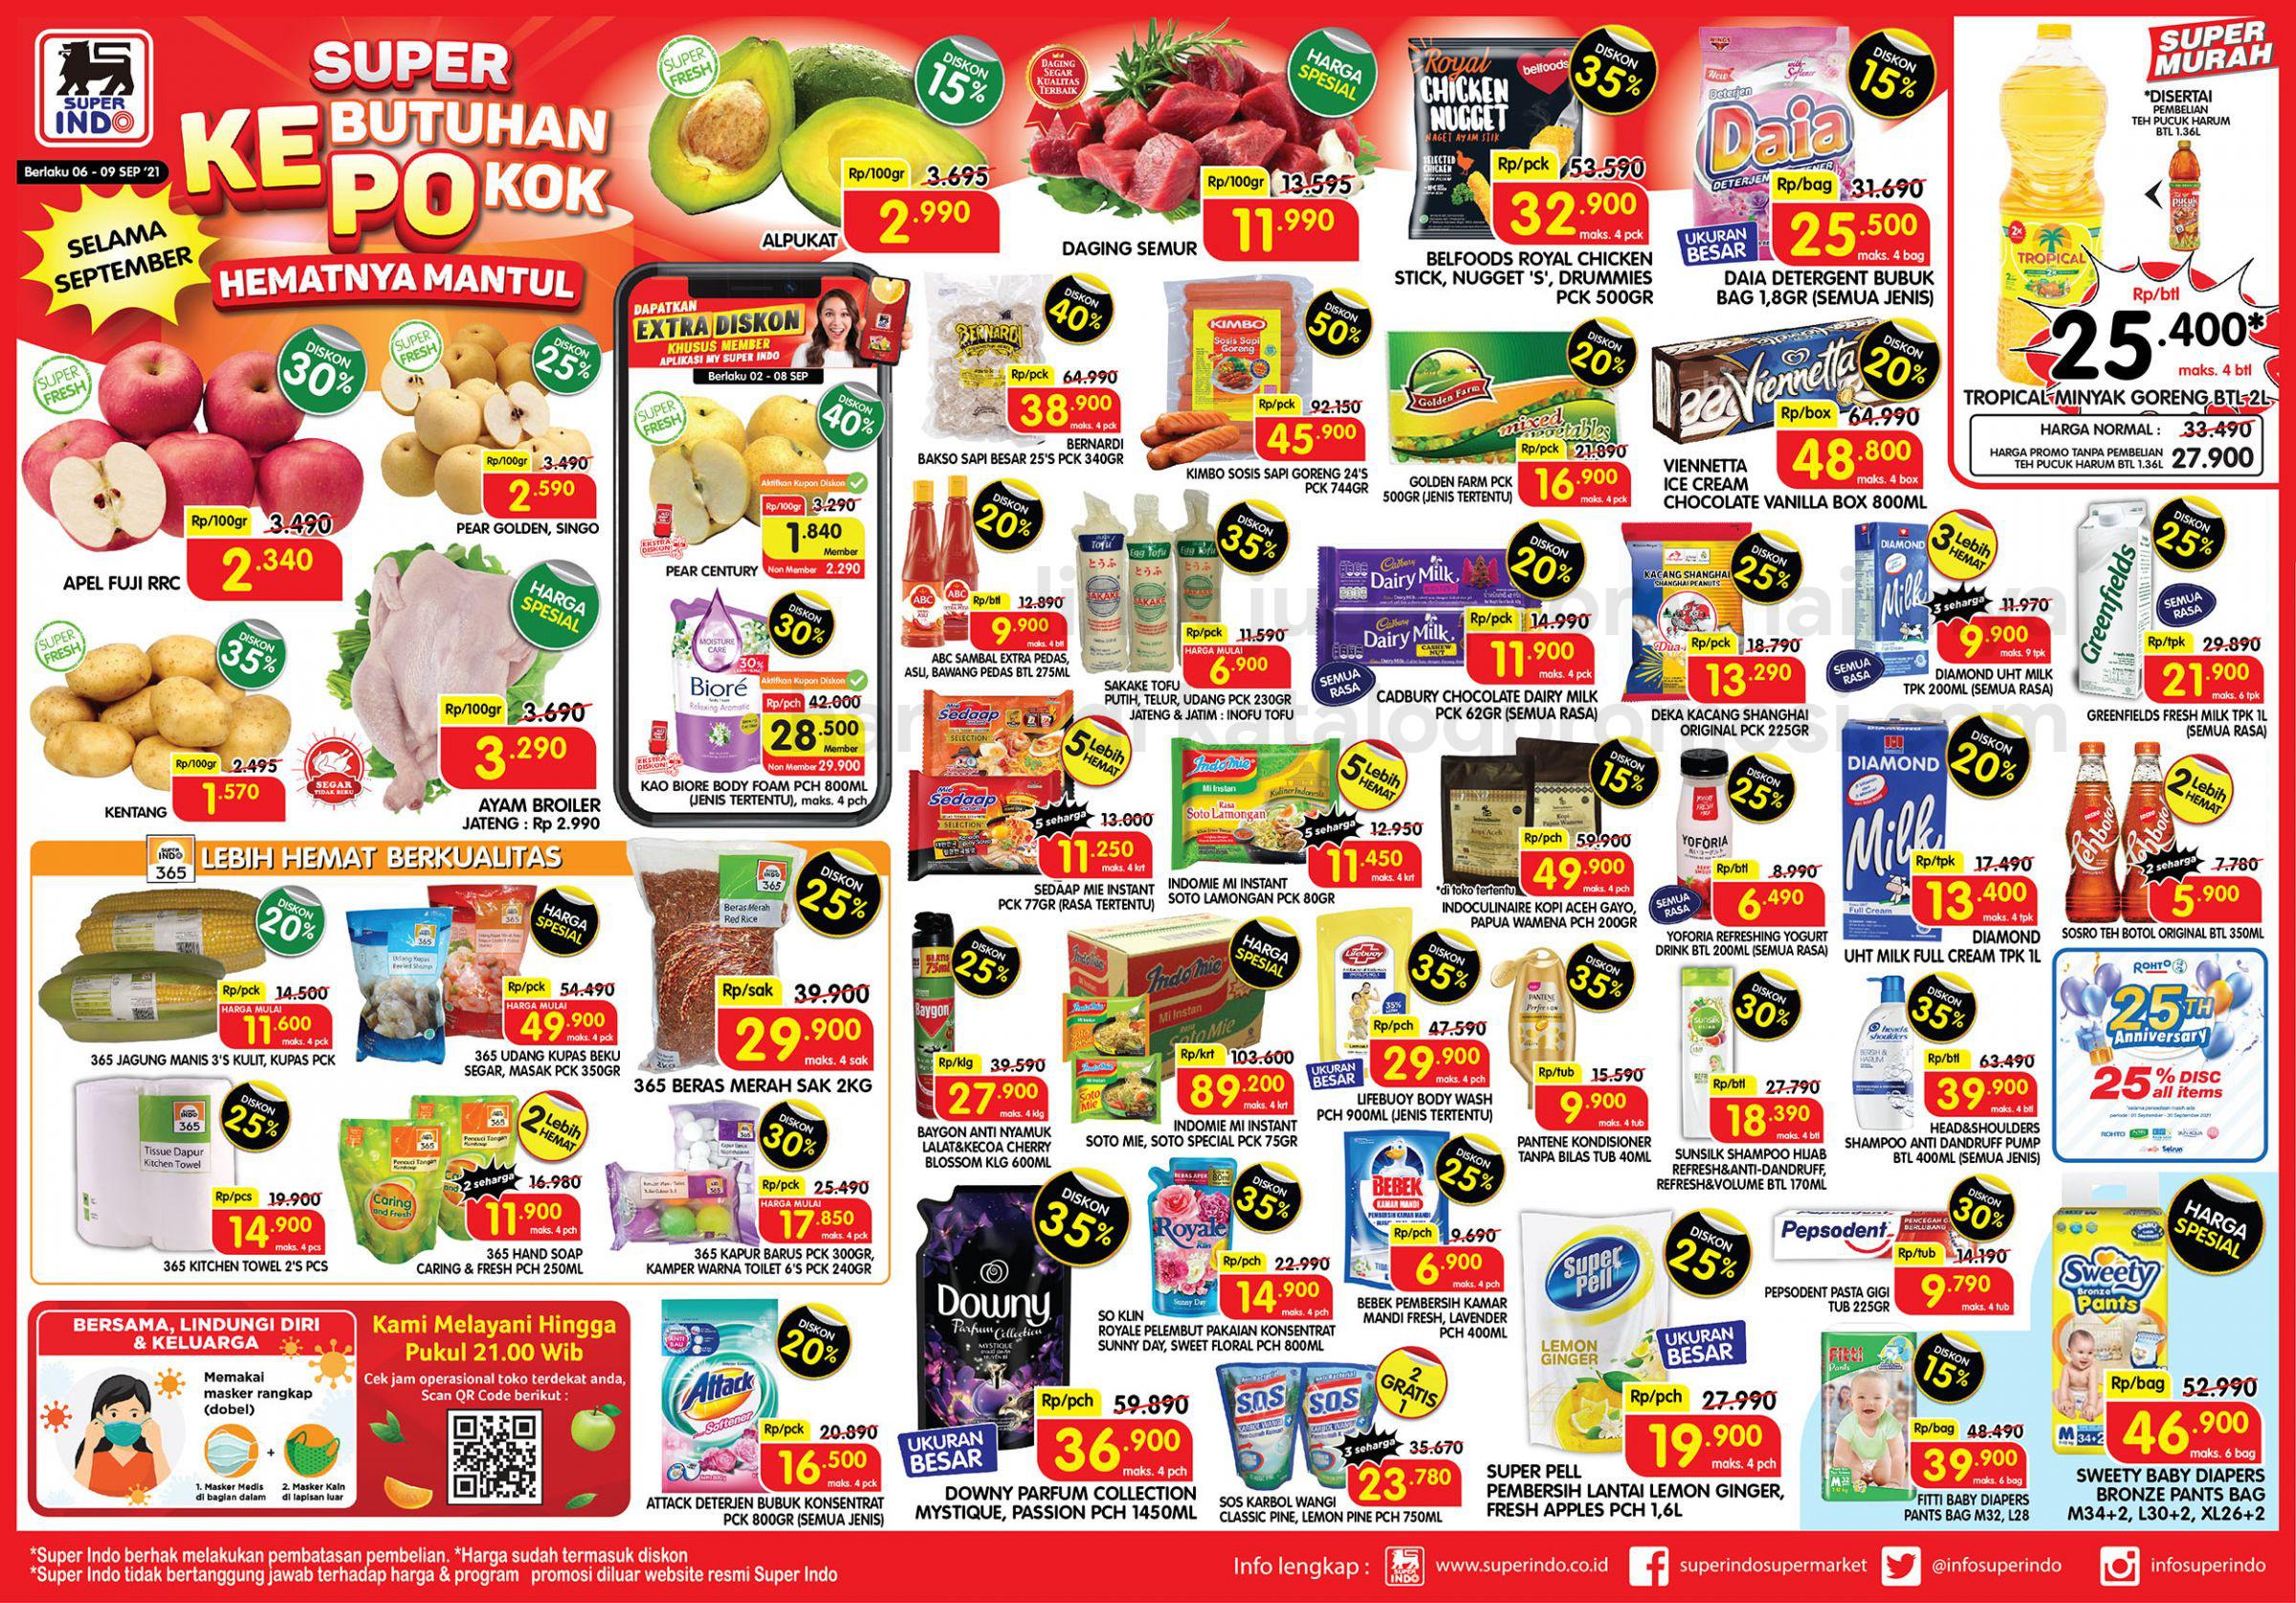 Promo Superindo Katalog Awal Pekan (Weekday) periode 06-09 SEPTEMBER 2021